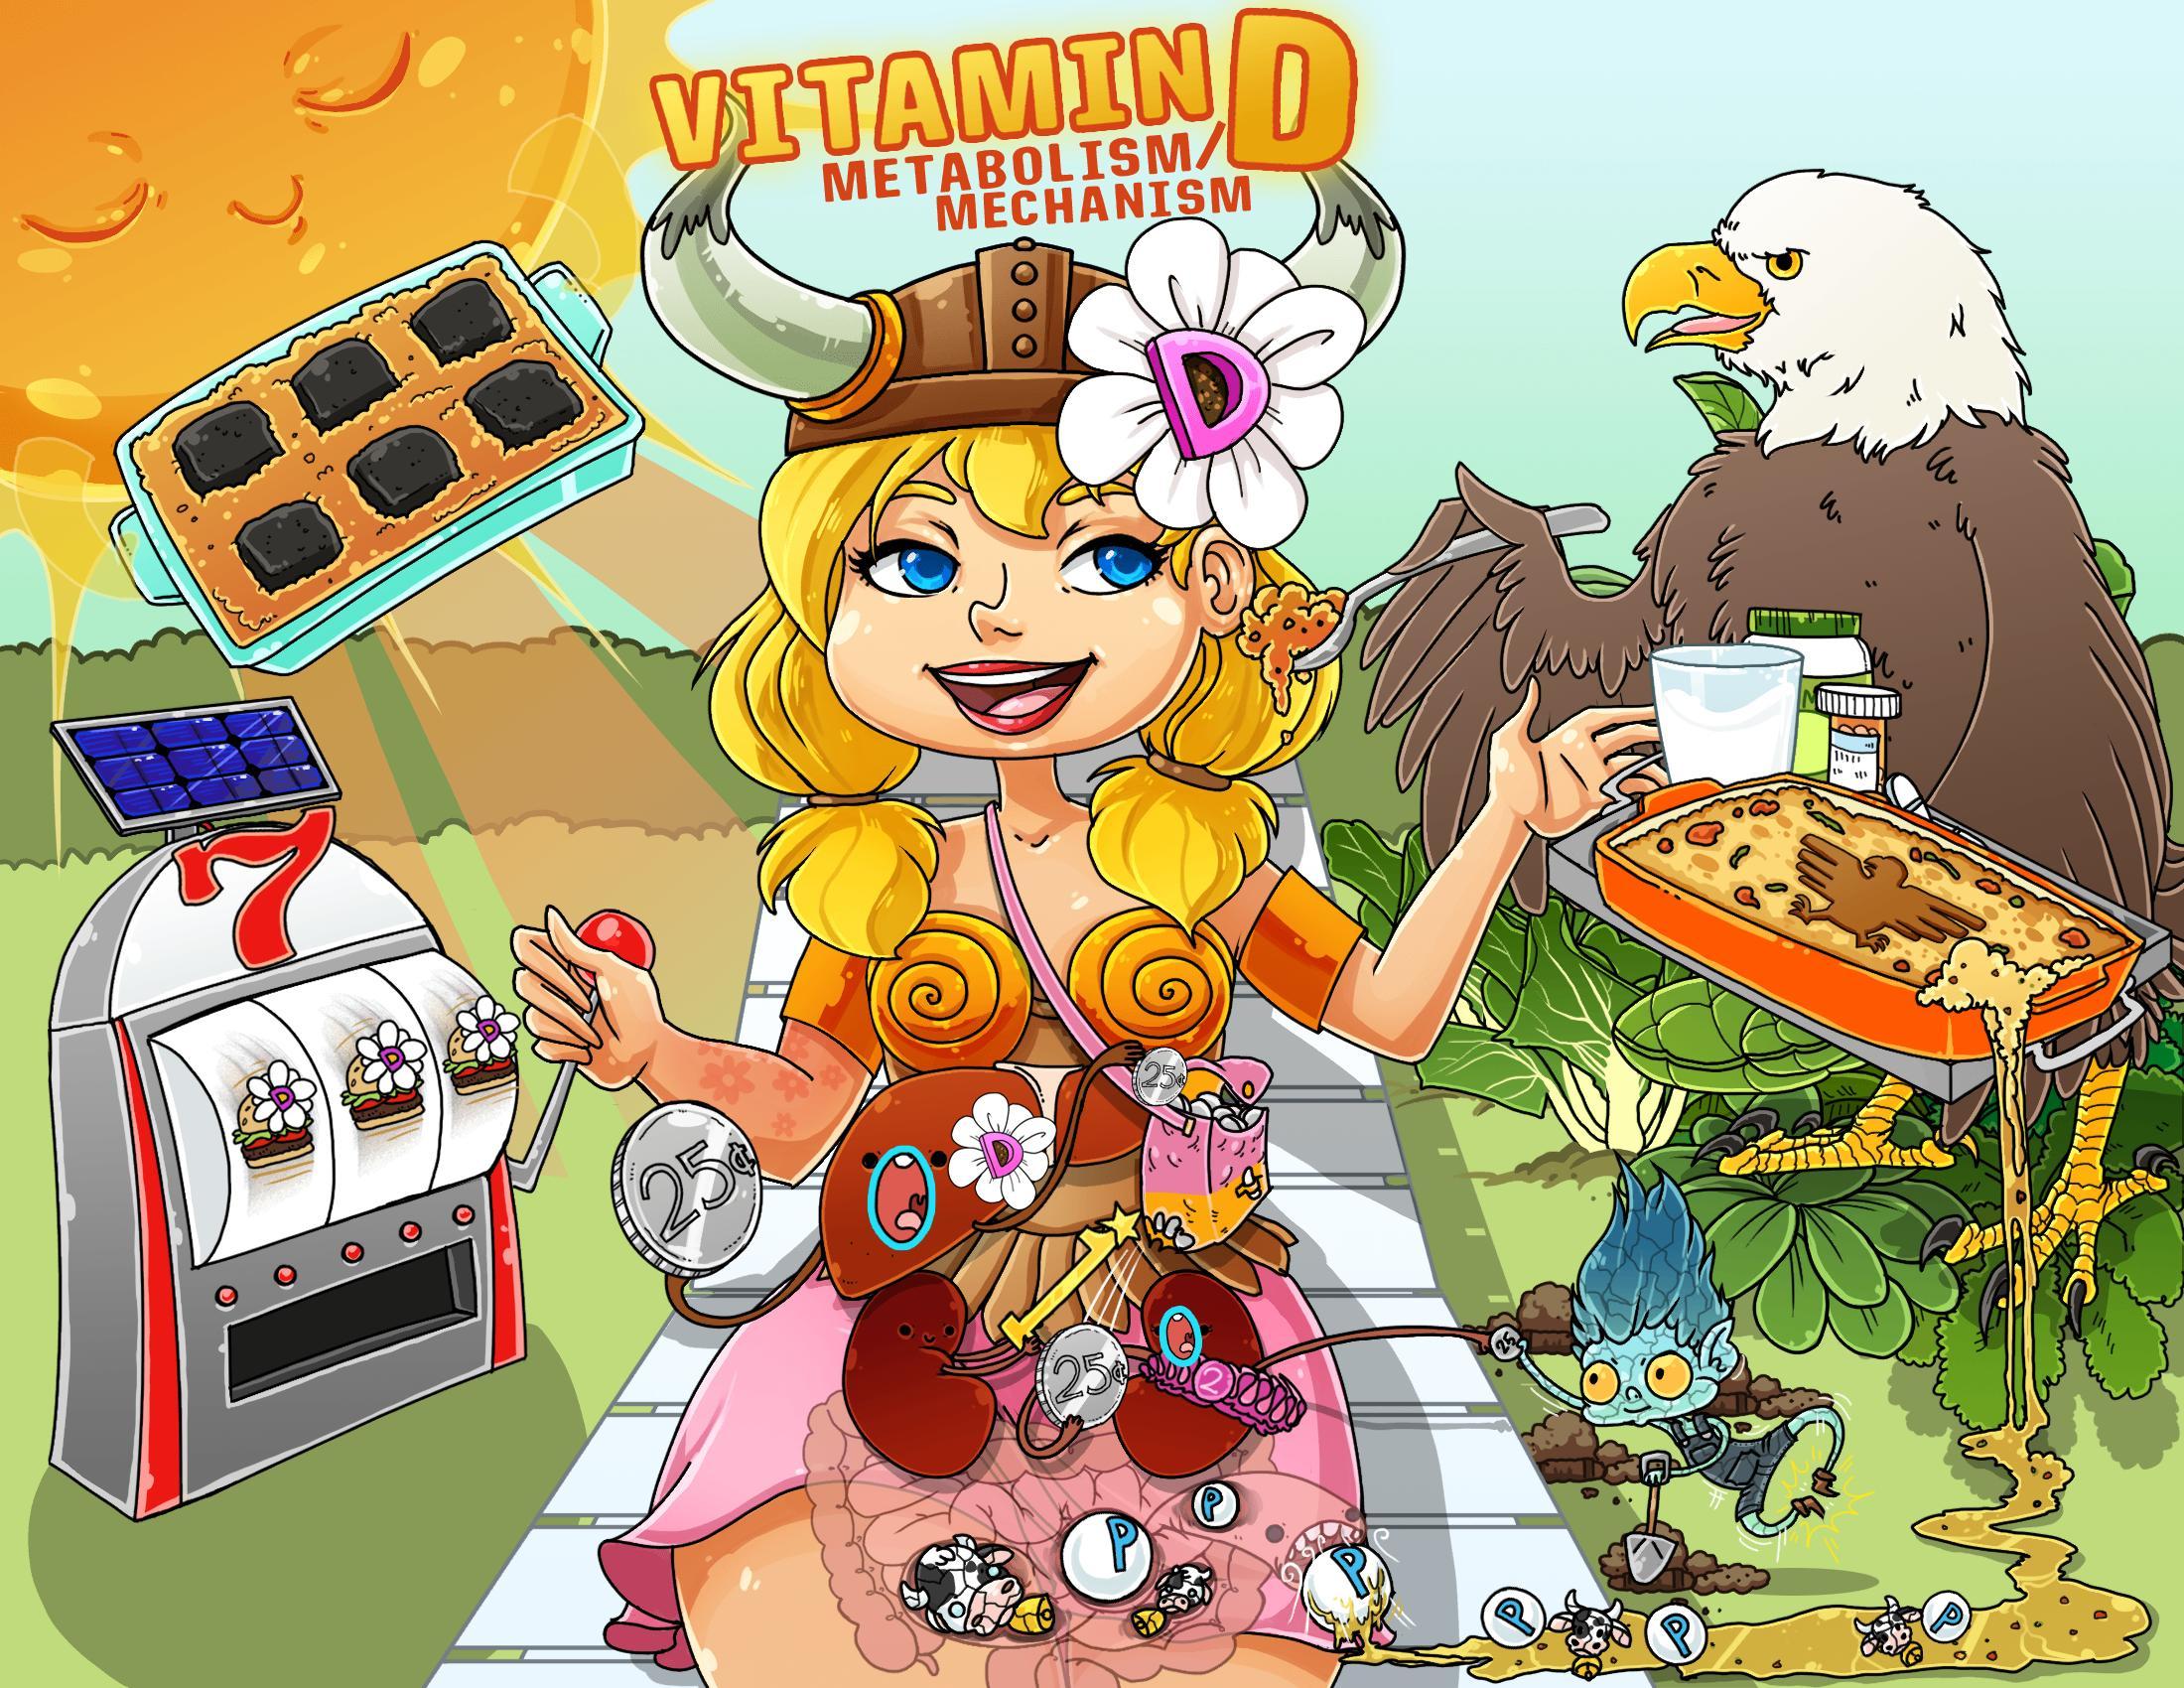 Vitamin D Metabolism/Mechanism